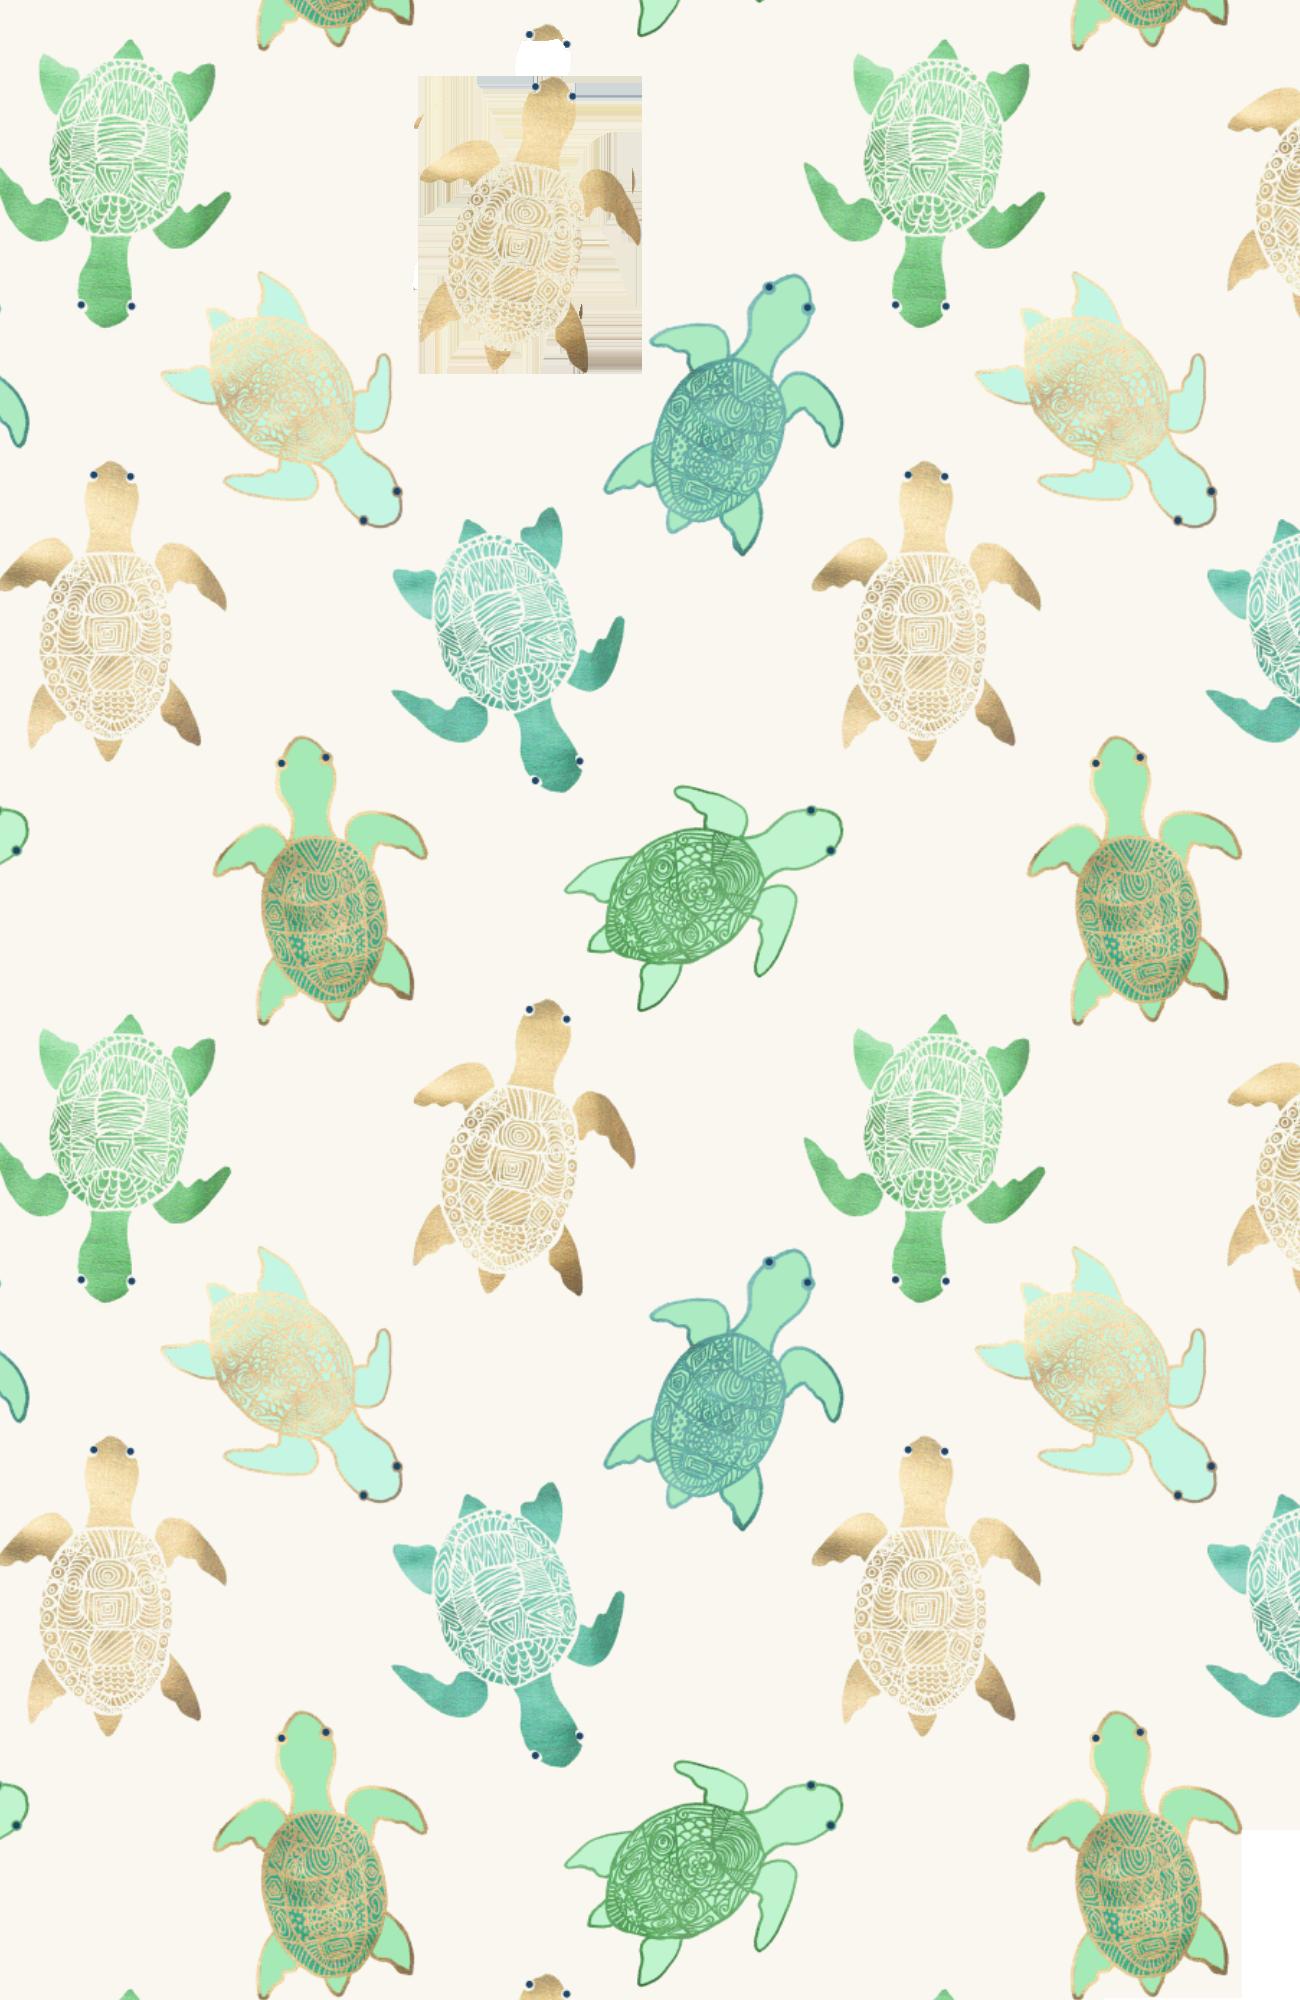 Casetify Iphone Art Design Animals Illustration Ideas Wallpaper Cute Turtl Watercolor Wallpaper Iphone Cute Pastel Wallpaper Iphone Wallpaper Pattern